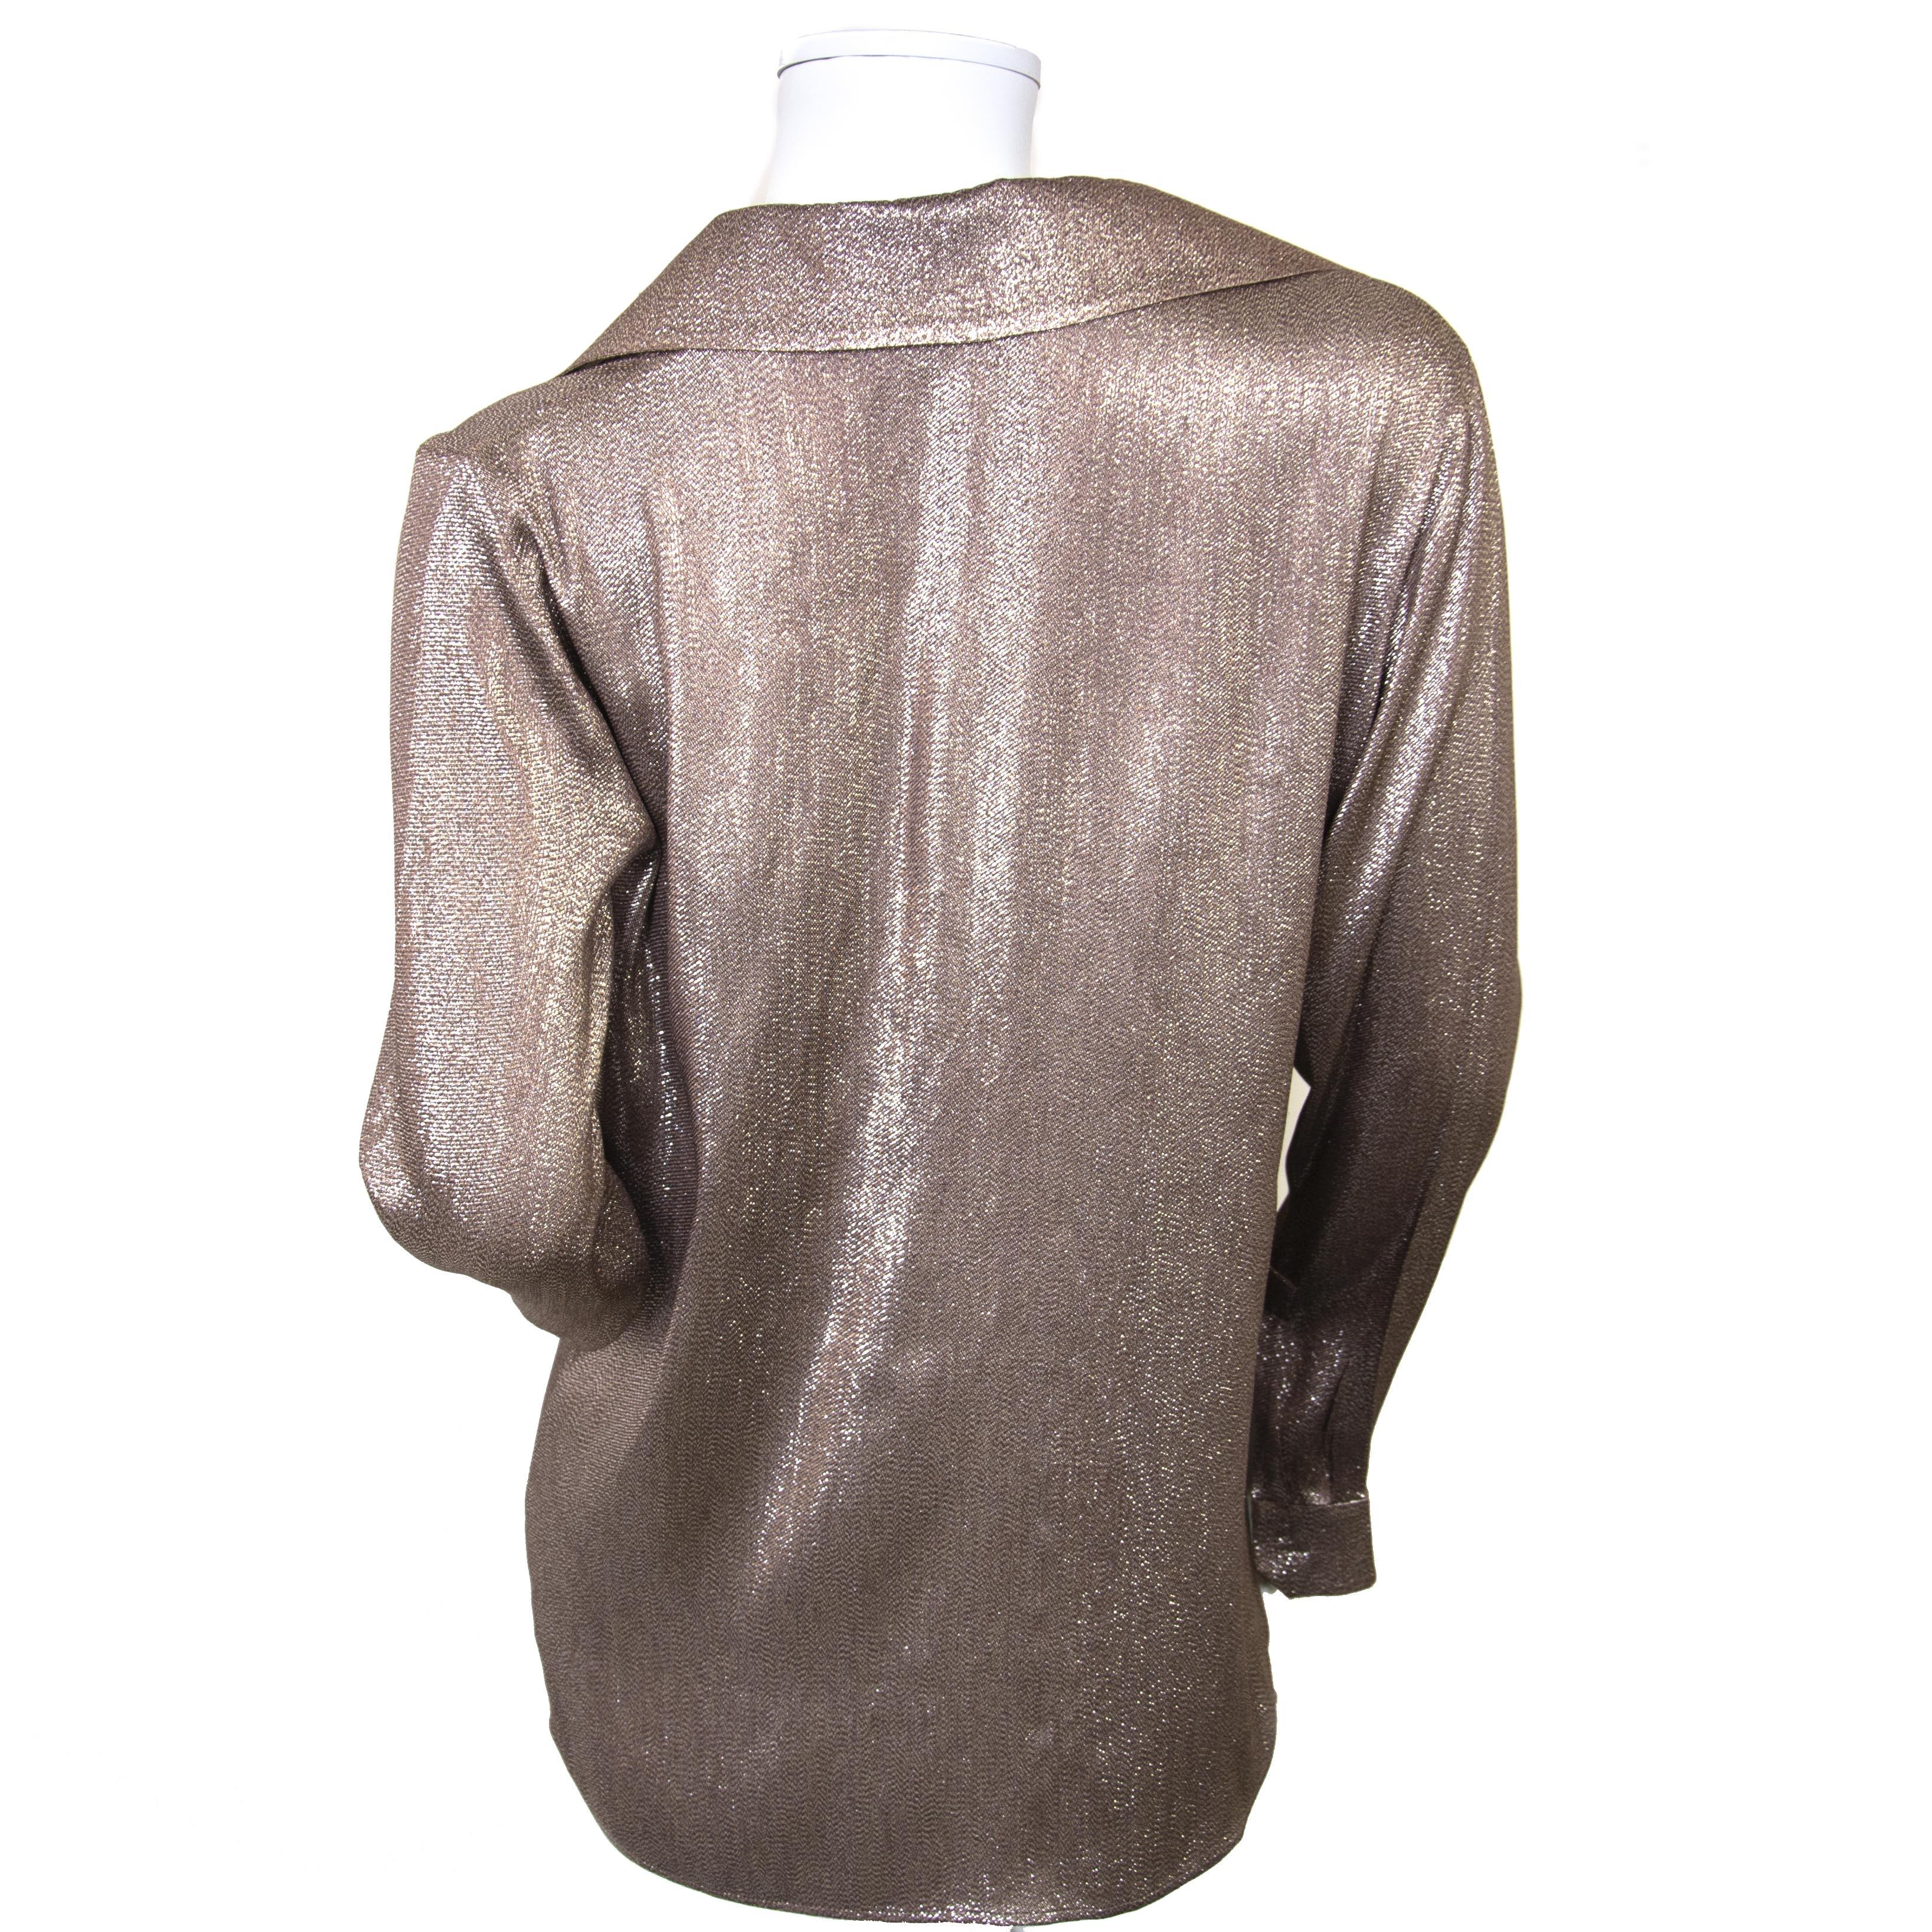 Gucci Silk Shimmer Blouse